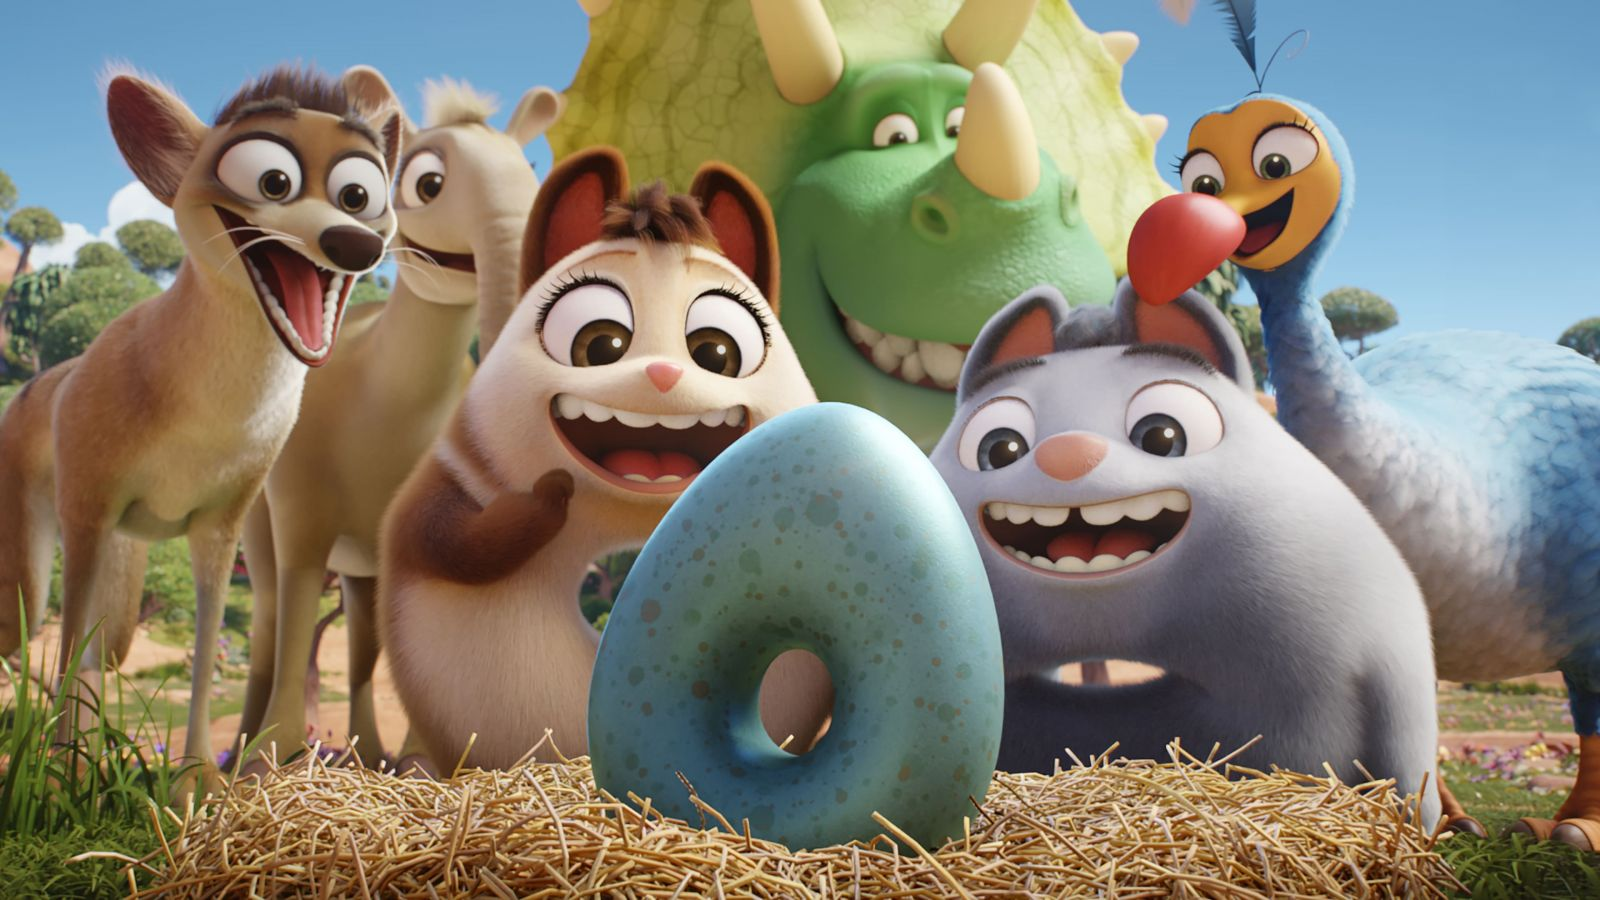 Watch Animation Extinct (2021) Full Movies Full HD Free Online